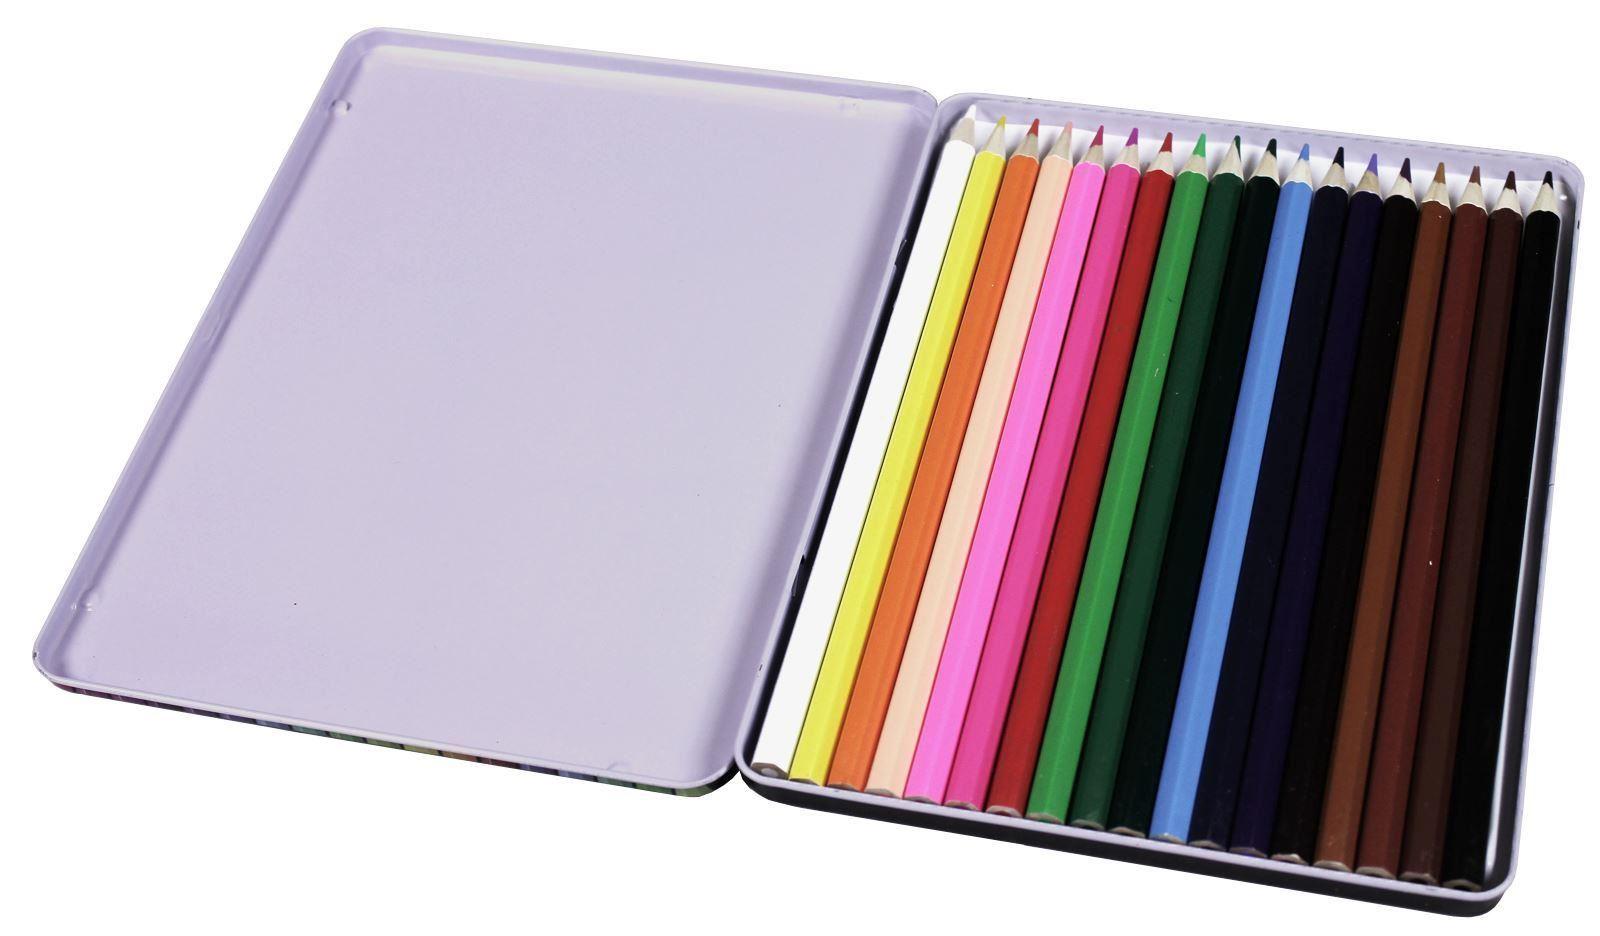 Terapia-De-Color-Colorante-Lapices-amp-Plumas miniatura 7